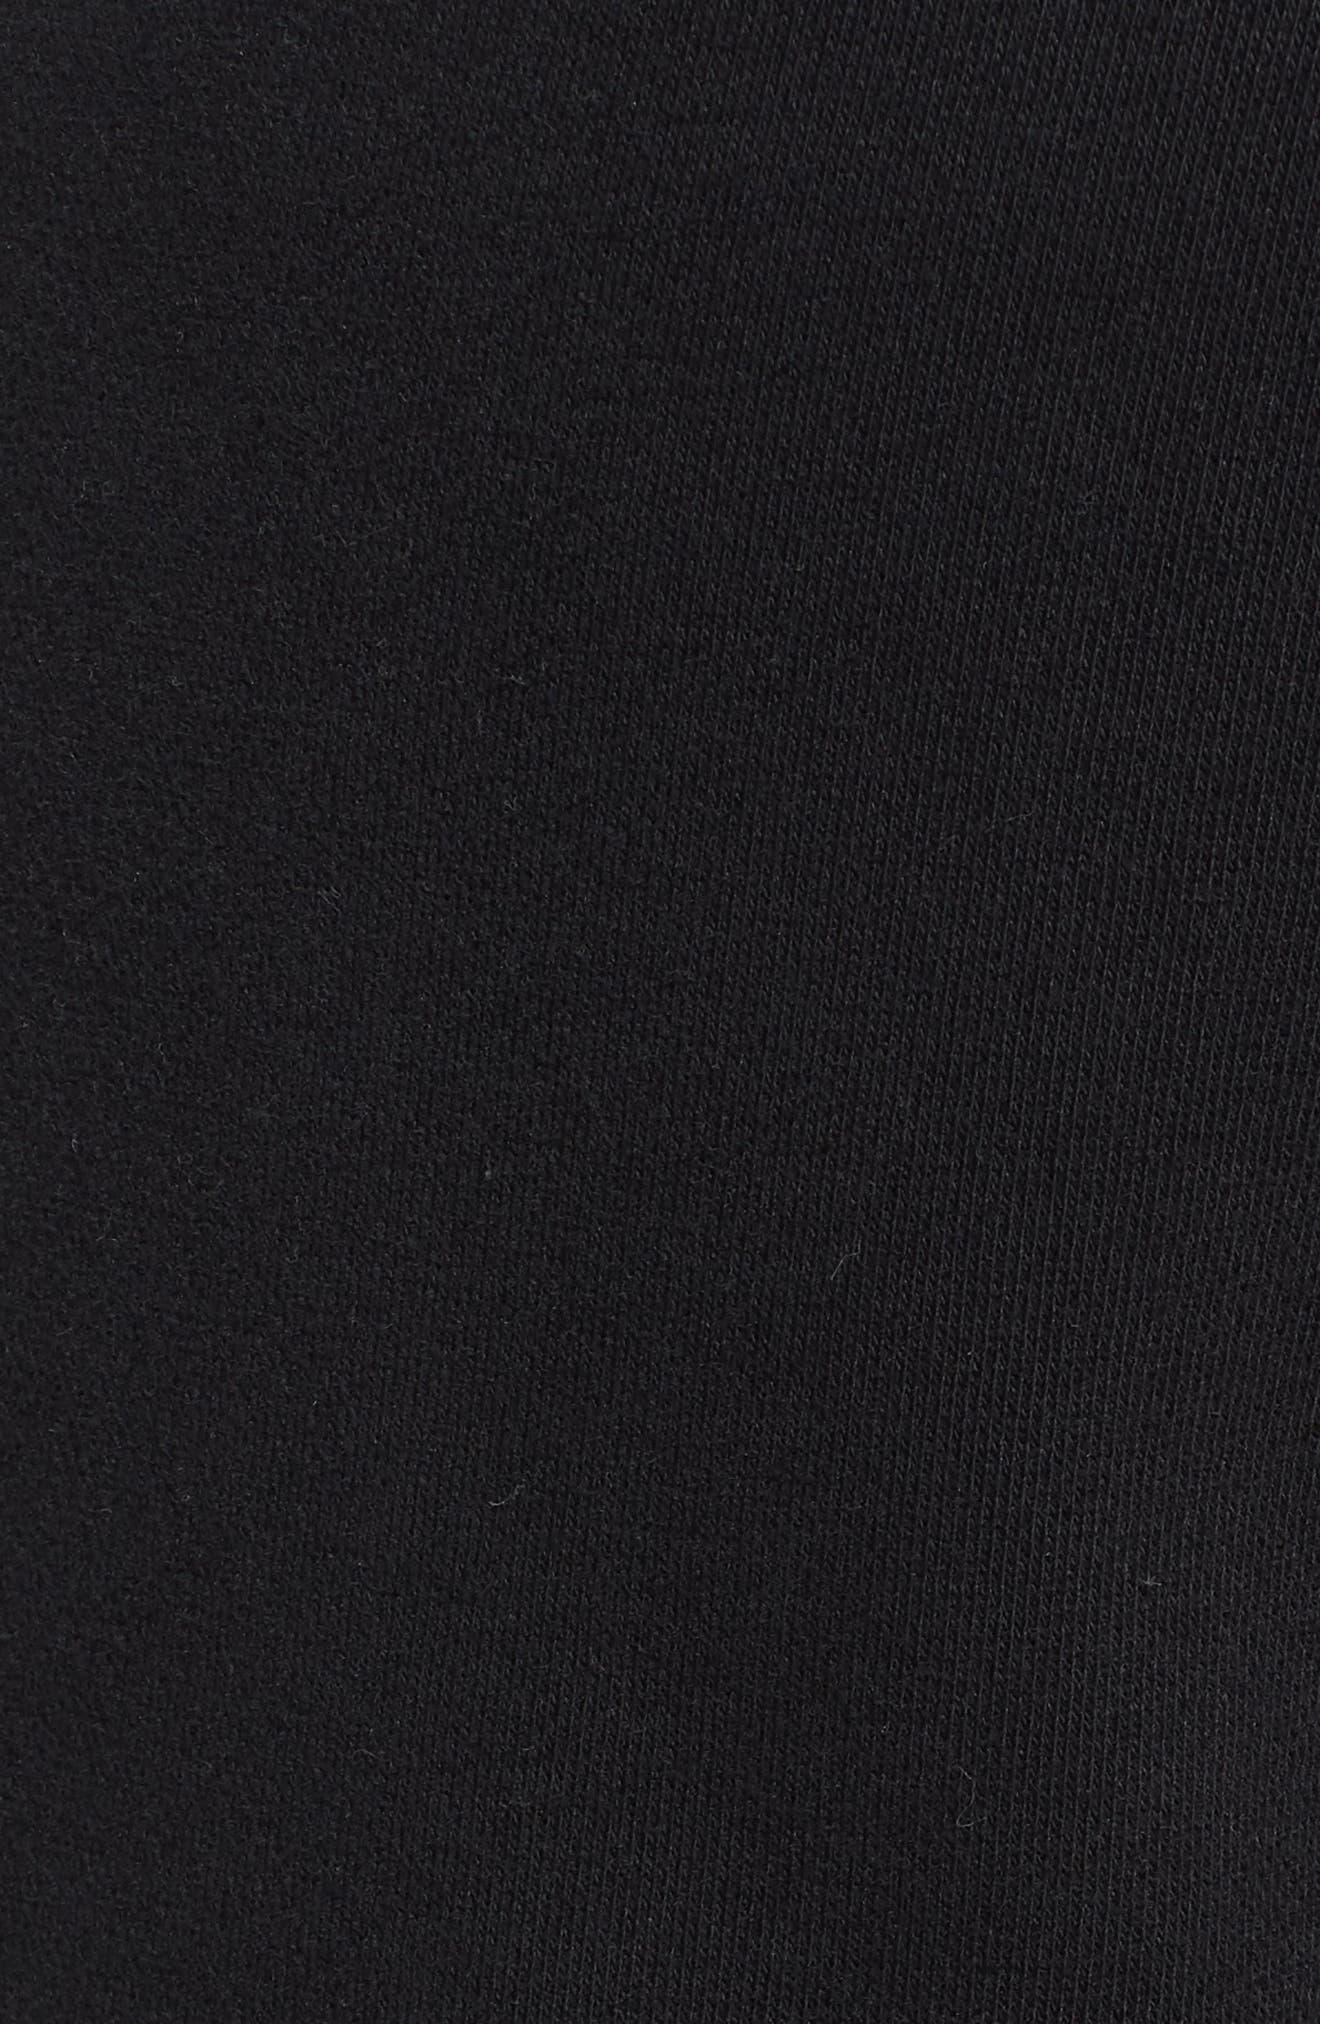 Essentials Jogger Pants,                             Alternate thumbnail 5, color,                             001